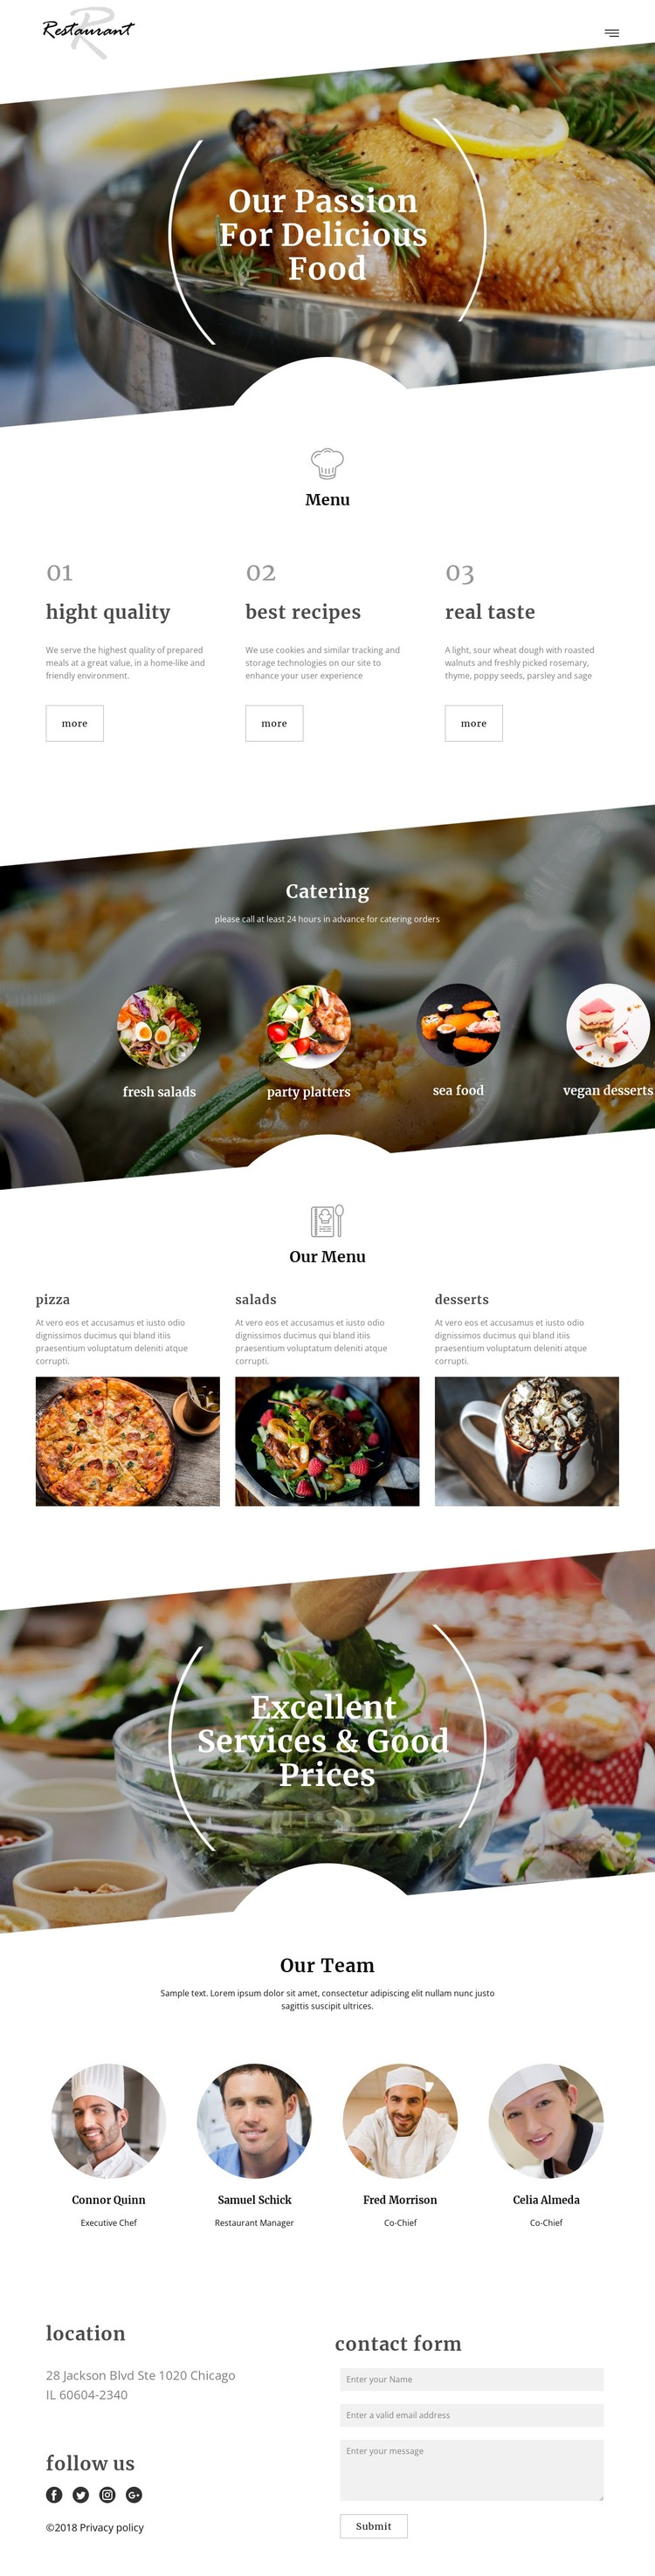 Executive chef recipes Static Site Generator